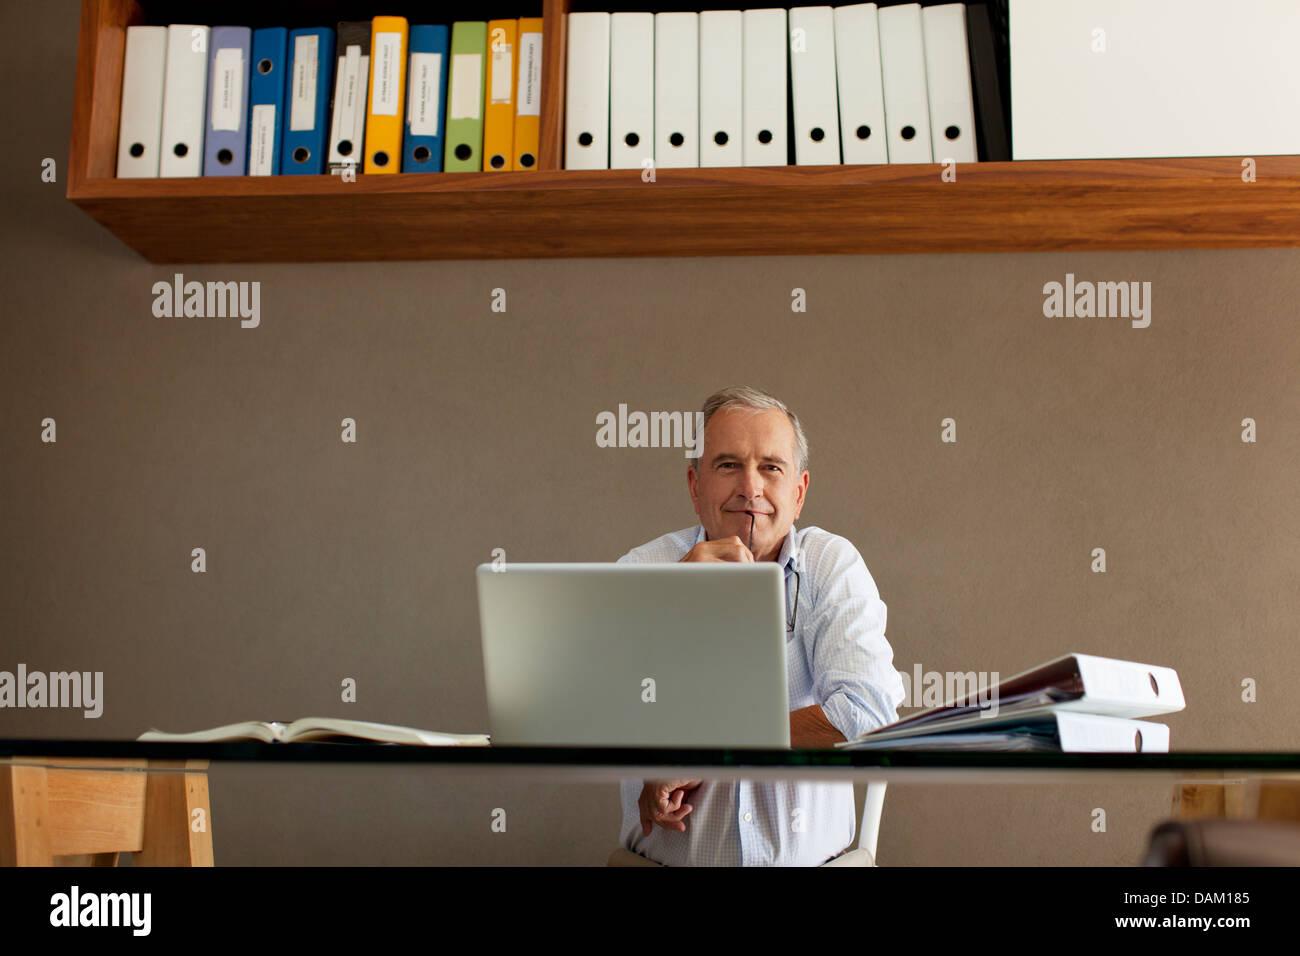 Older Man sitting at desk Photo Stock